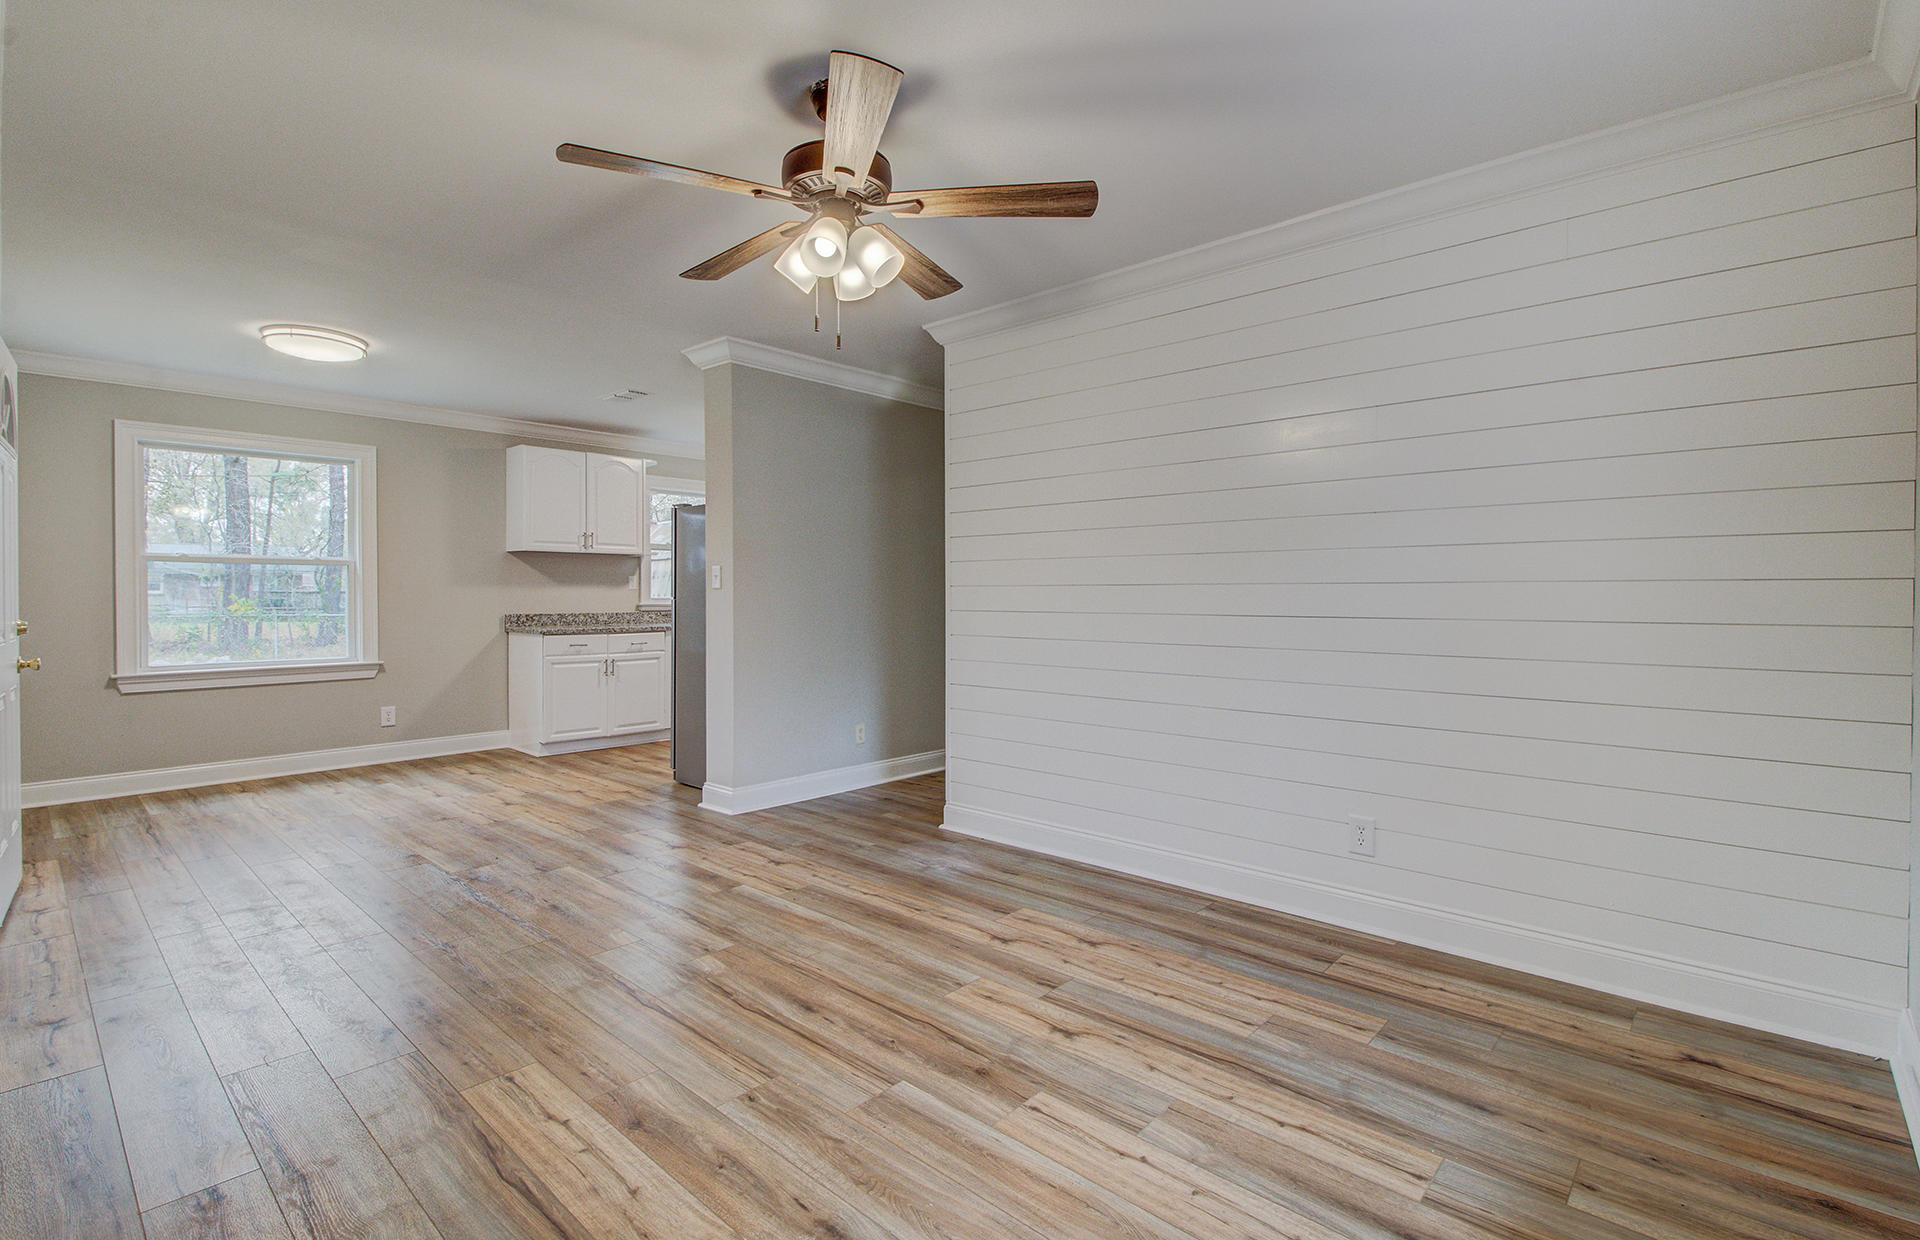 Sedgefield Section I Homes For Sale - 30 Aldene, Goose Creek, SC - 21